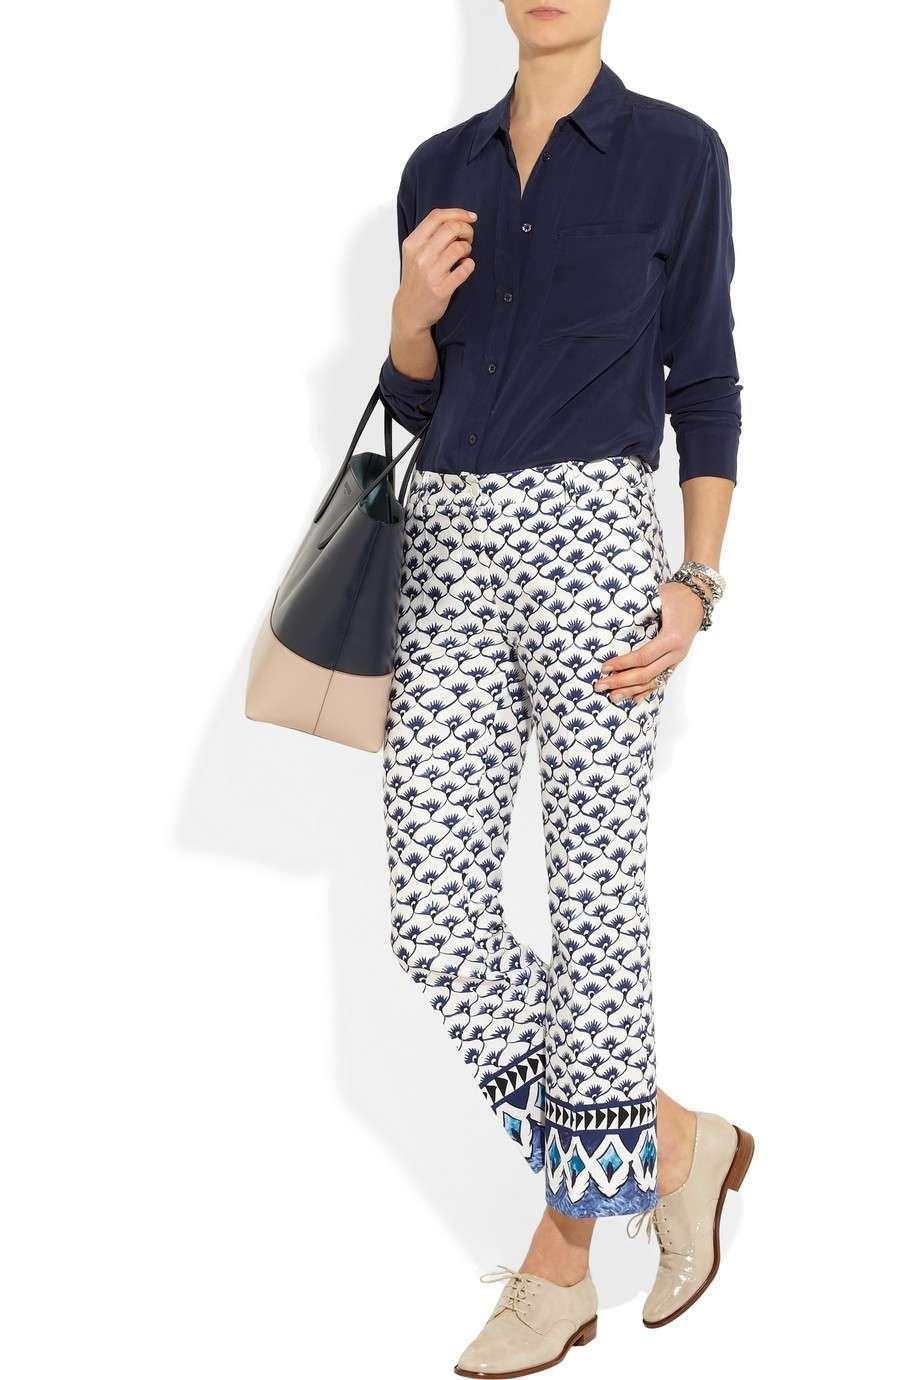 Francesine e pantaloni con stampa